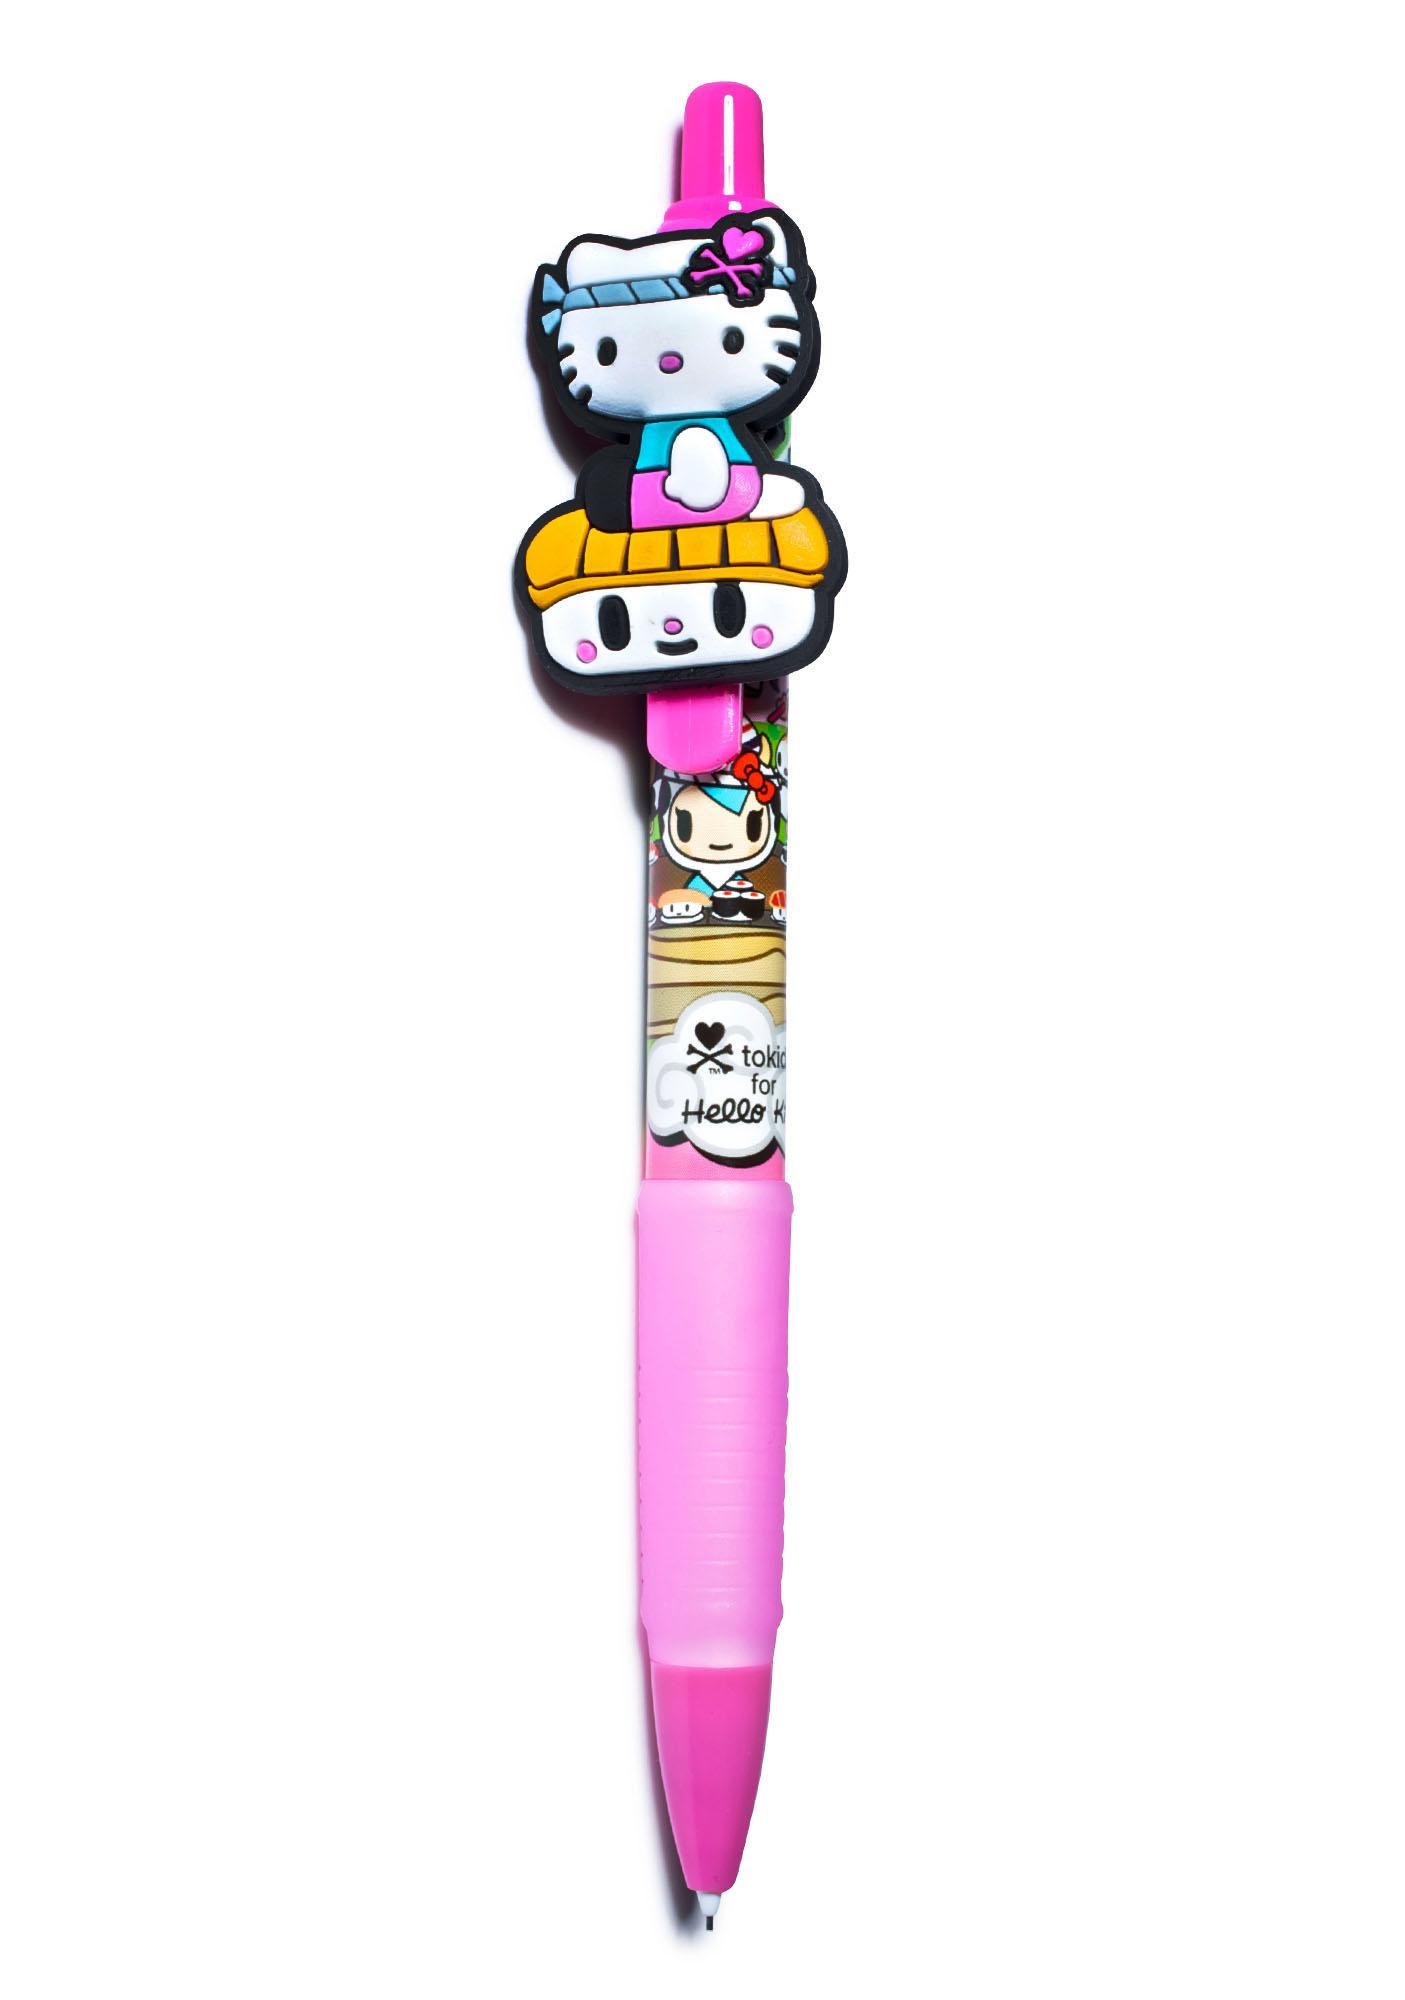 Tokidoki x Hello Kitty Sushi Mechanical Pencil